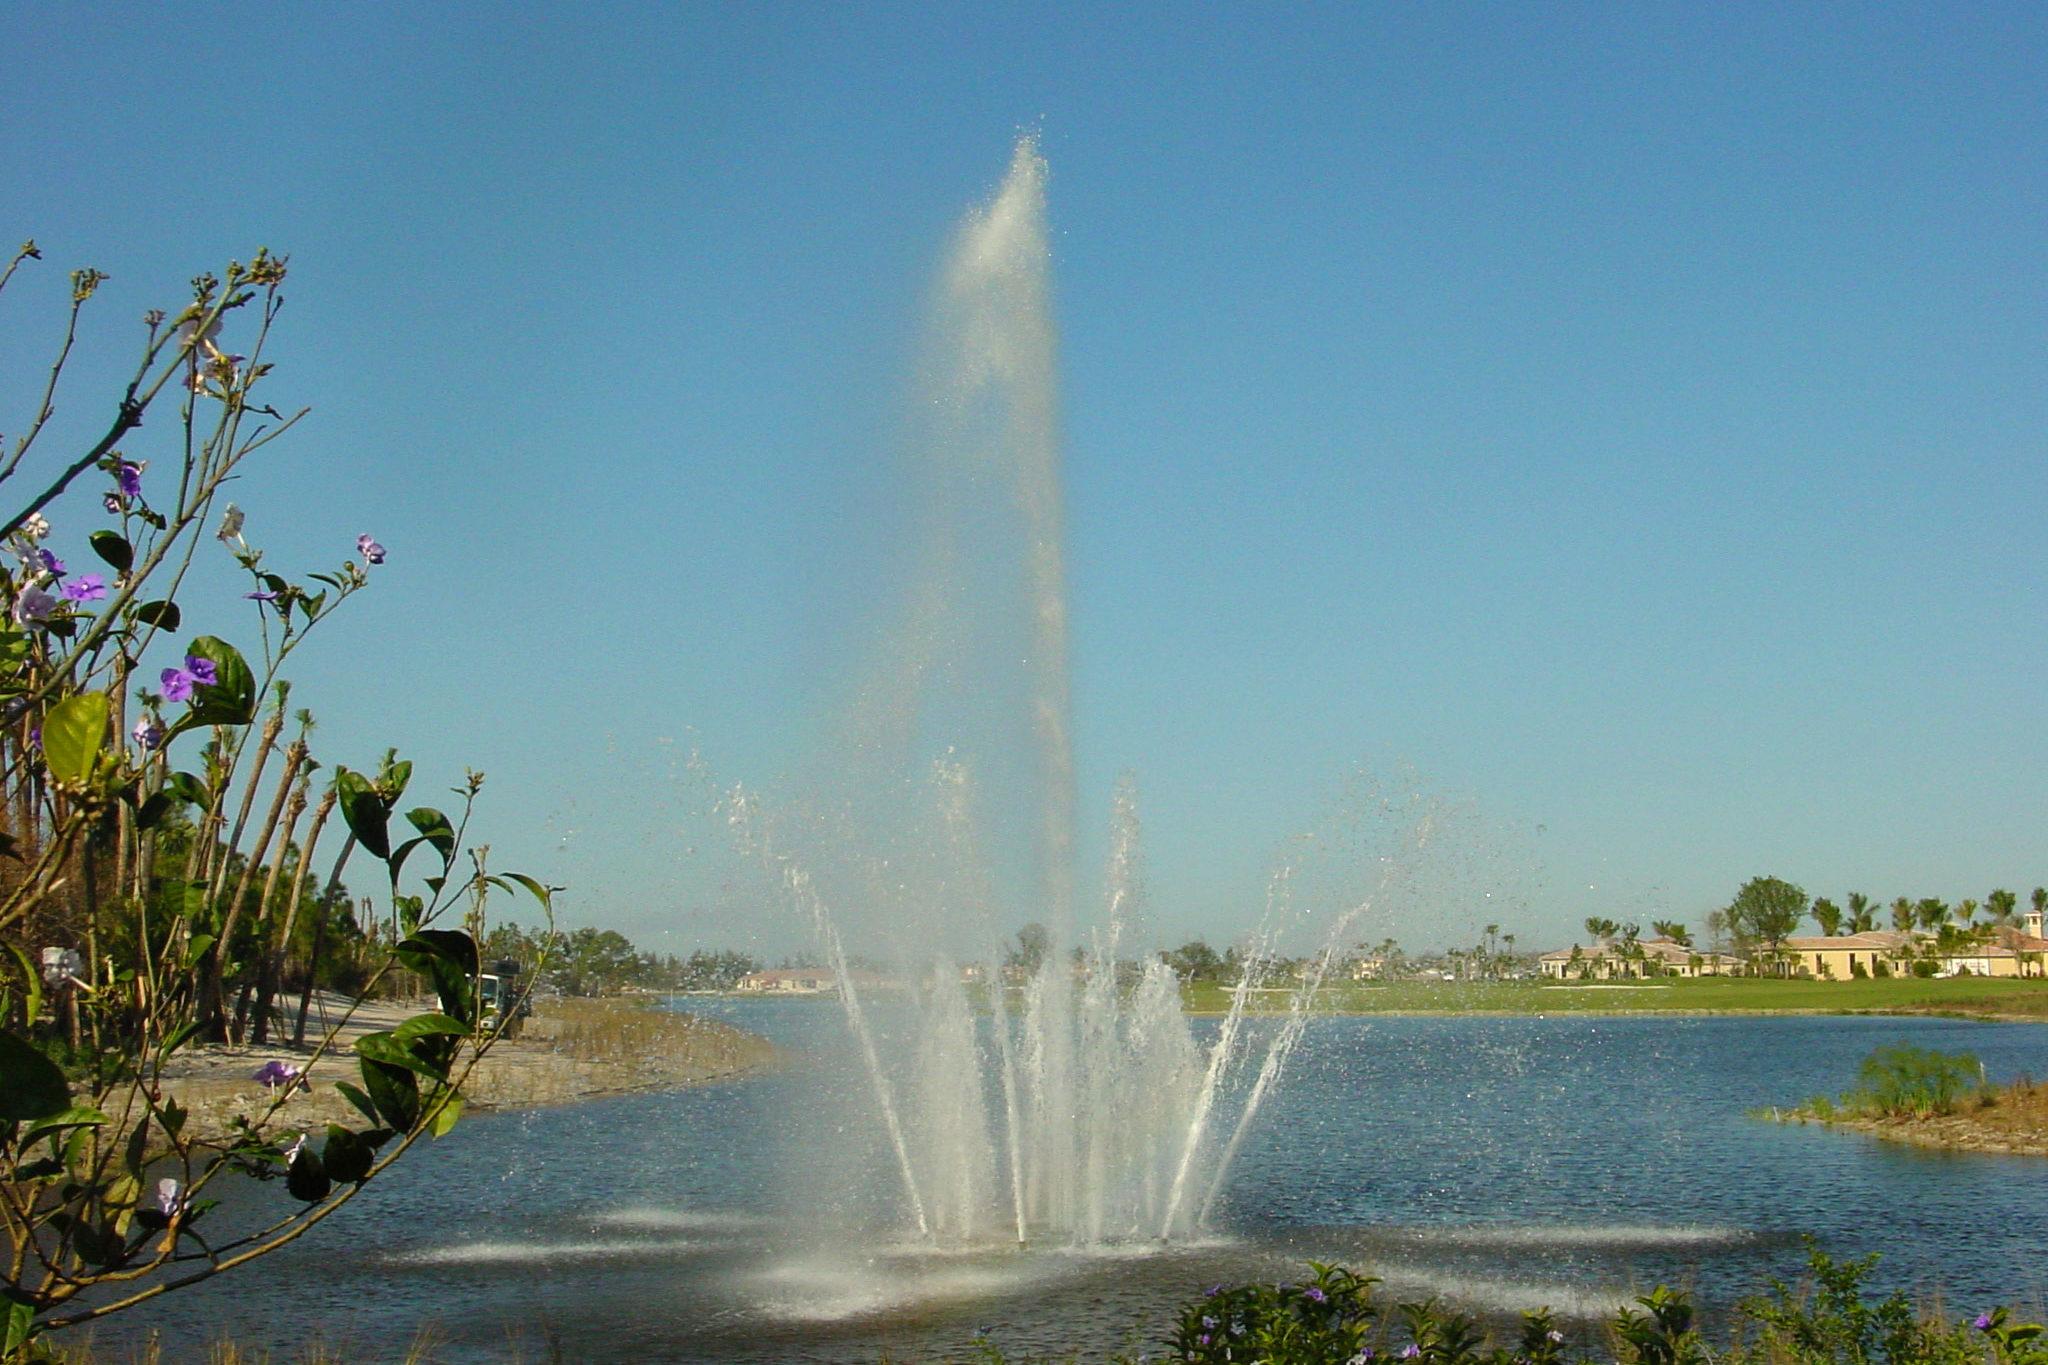 Custom Multi-Jet Floating Fountain